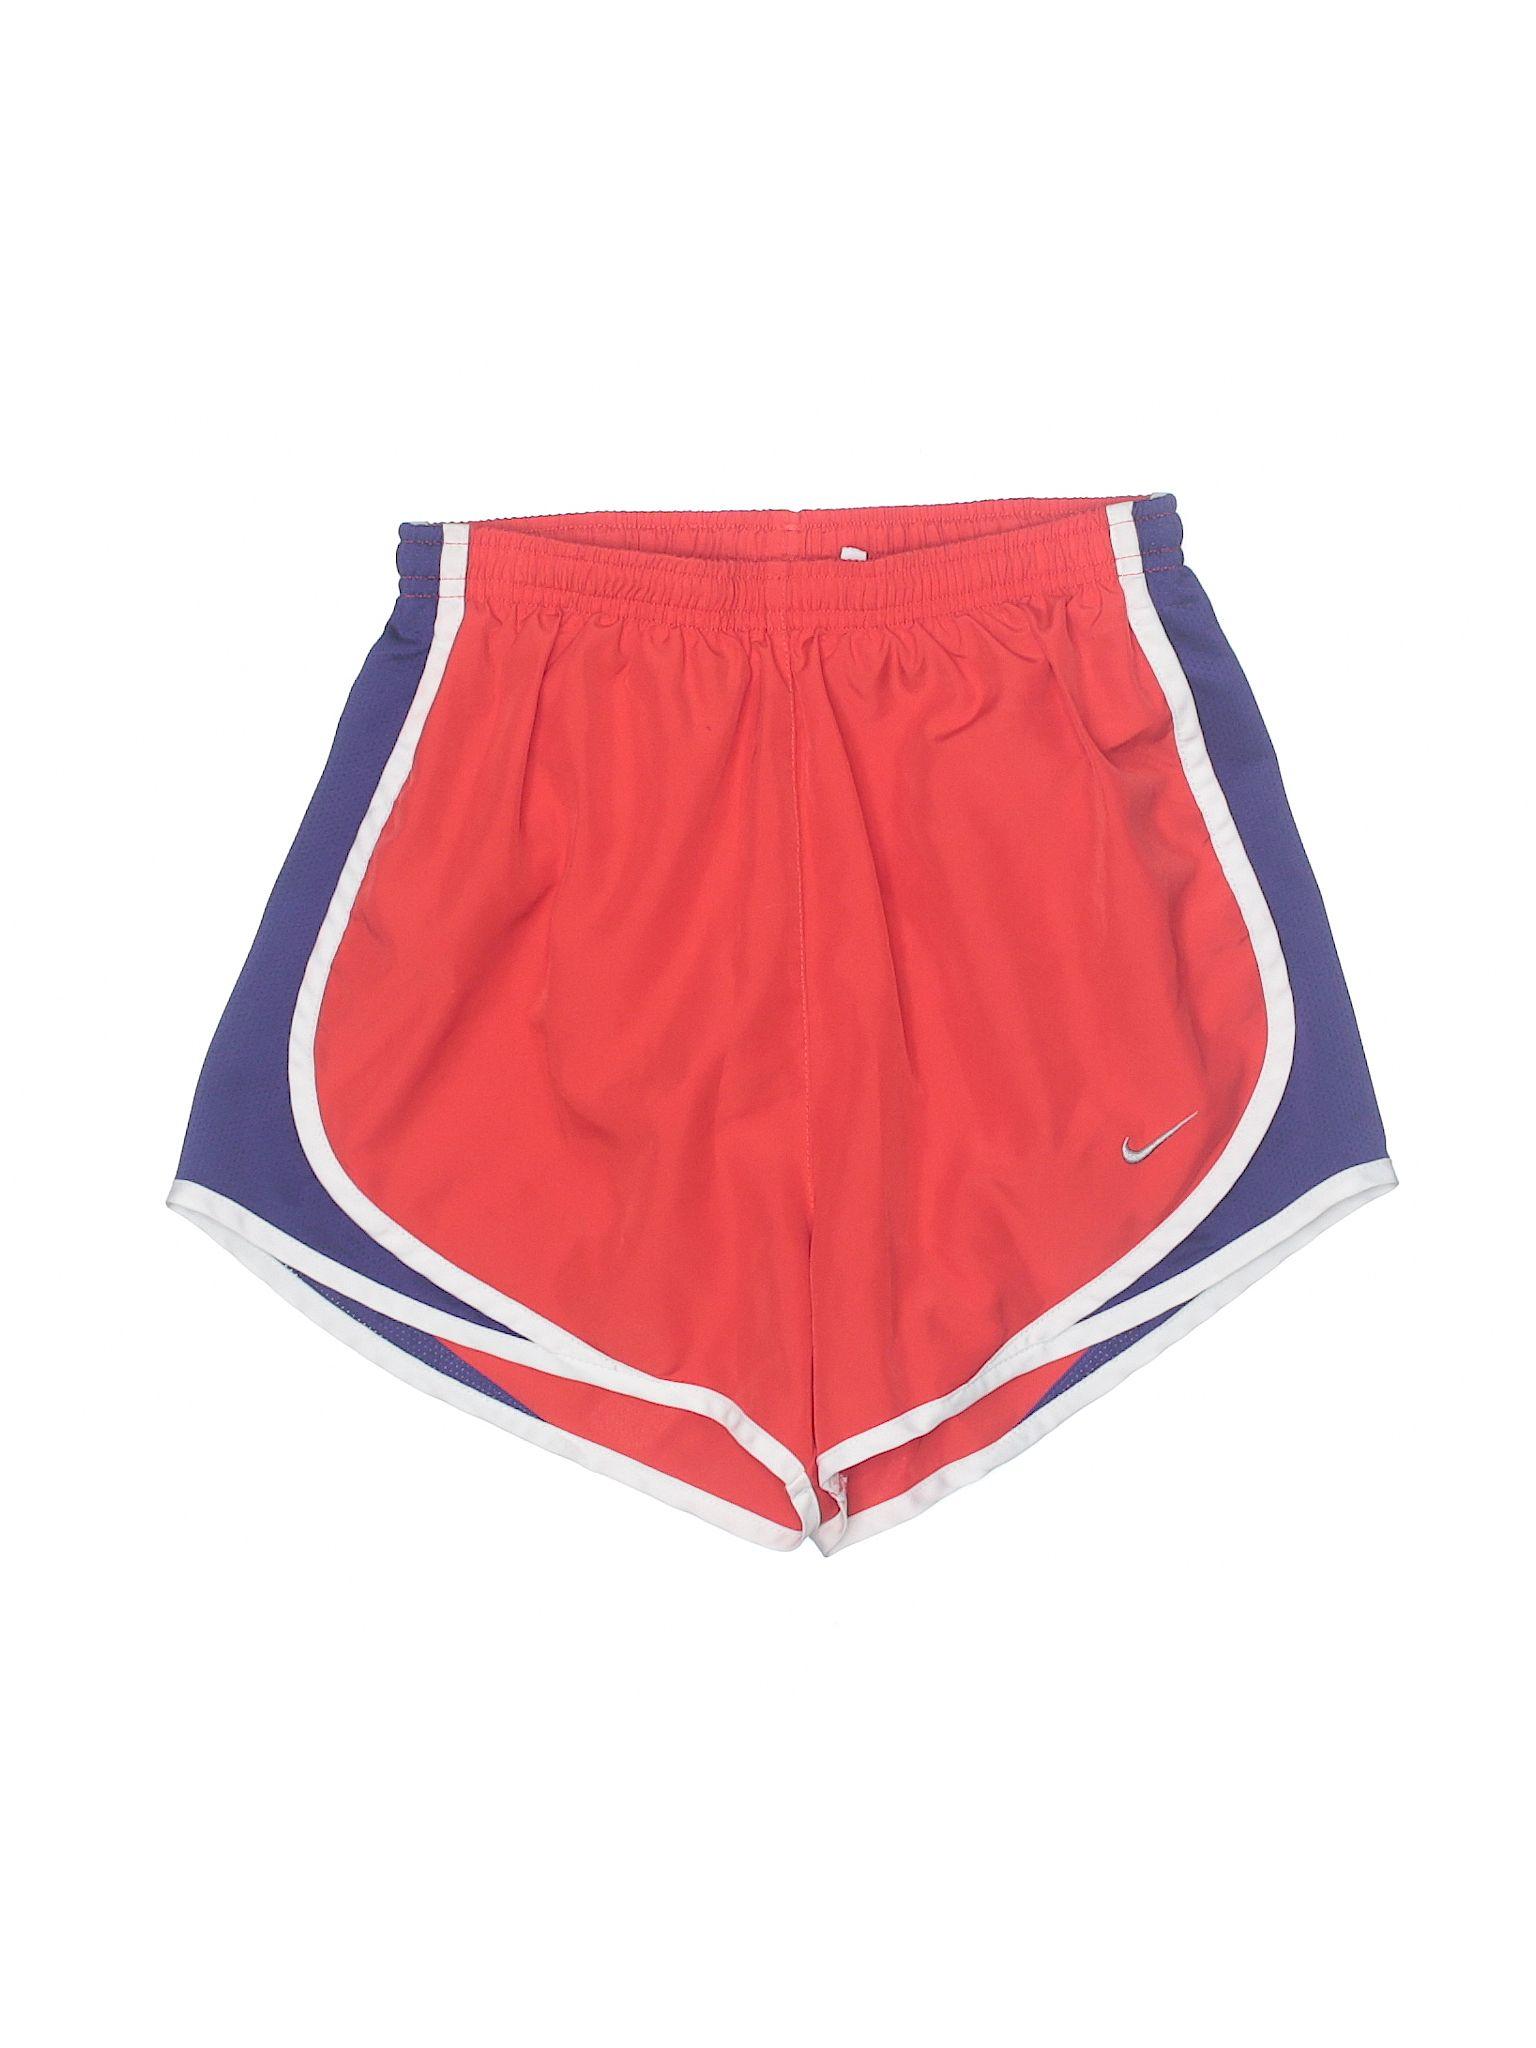 Athletic Shorts Athletic shorts, Nike athletic shorts